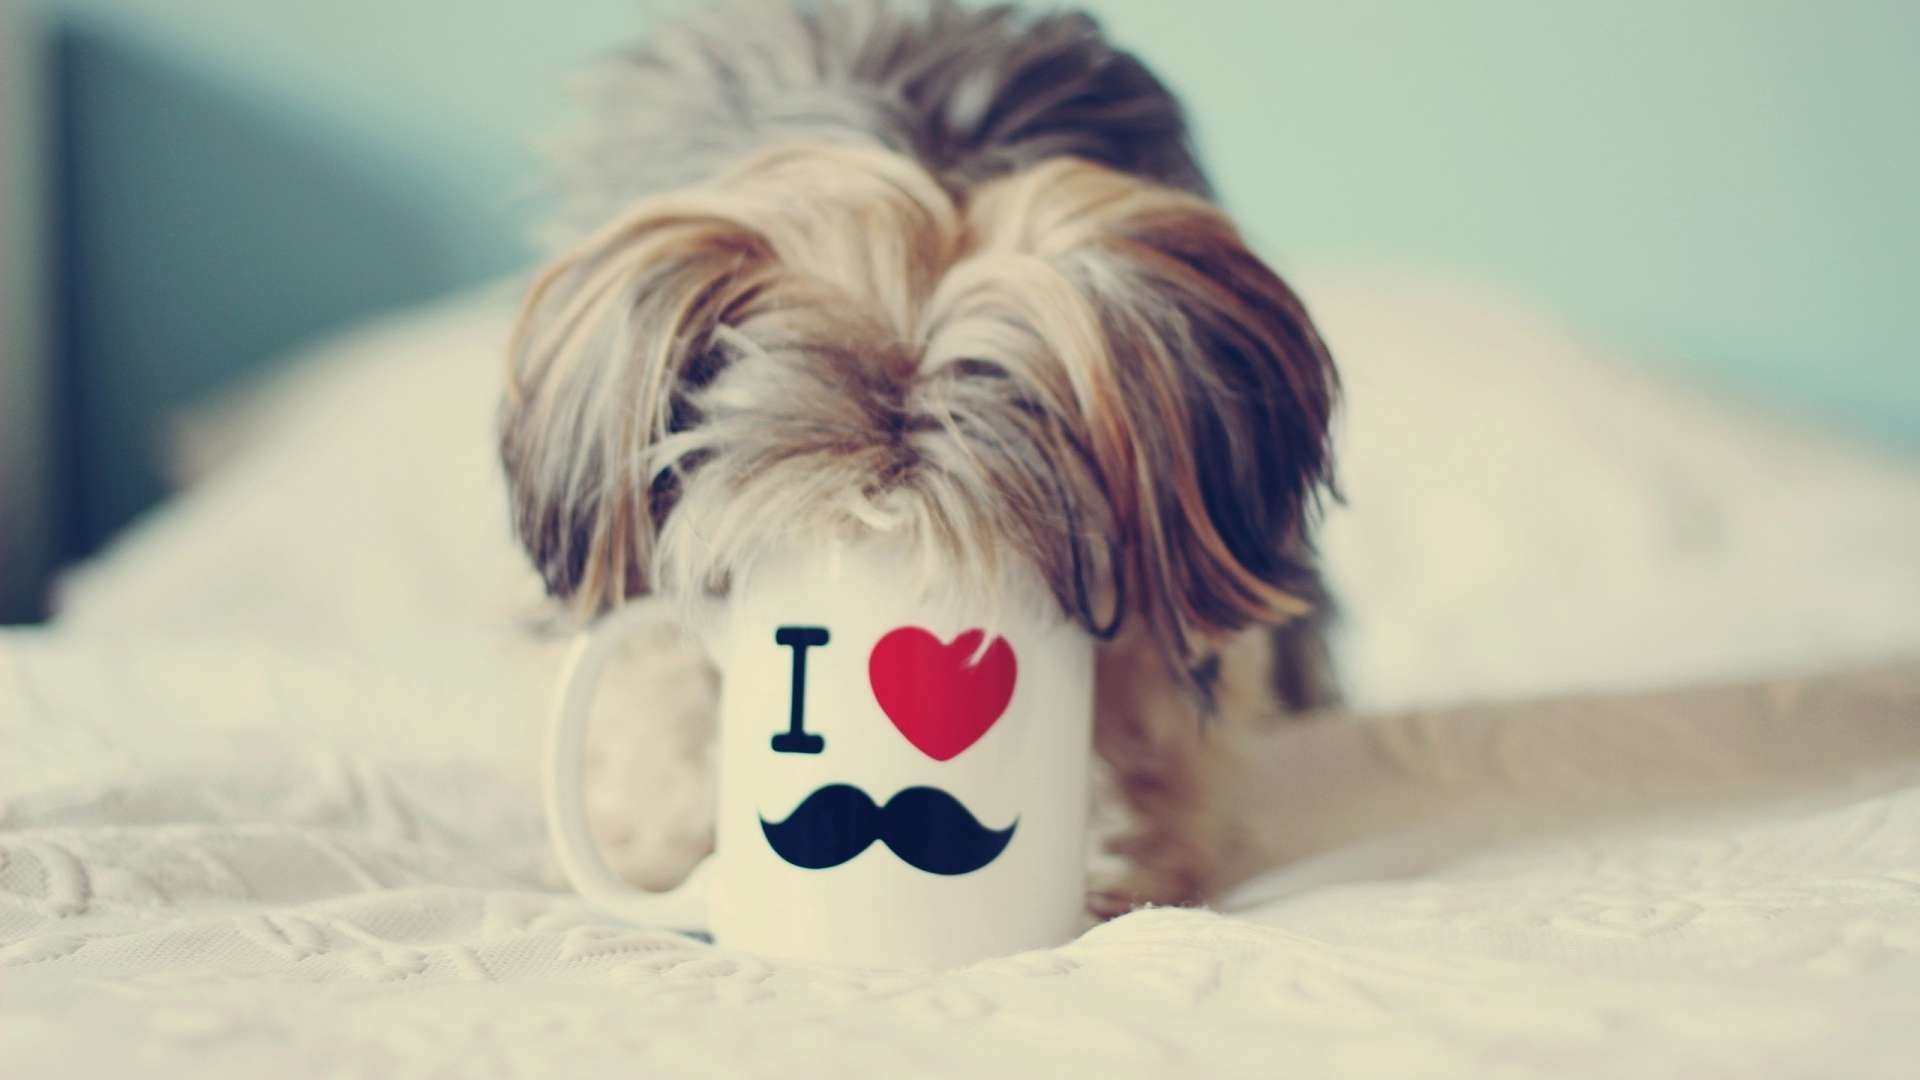 Yorkshire Terrier Love Mustache Wallpaper | HDWallWide